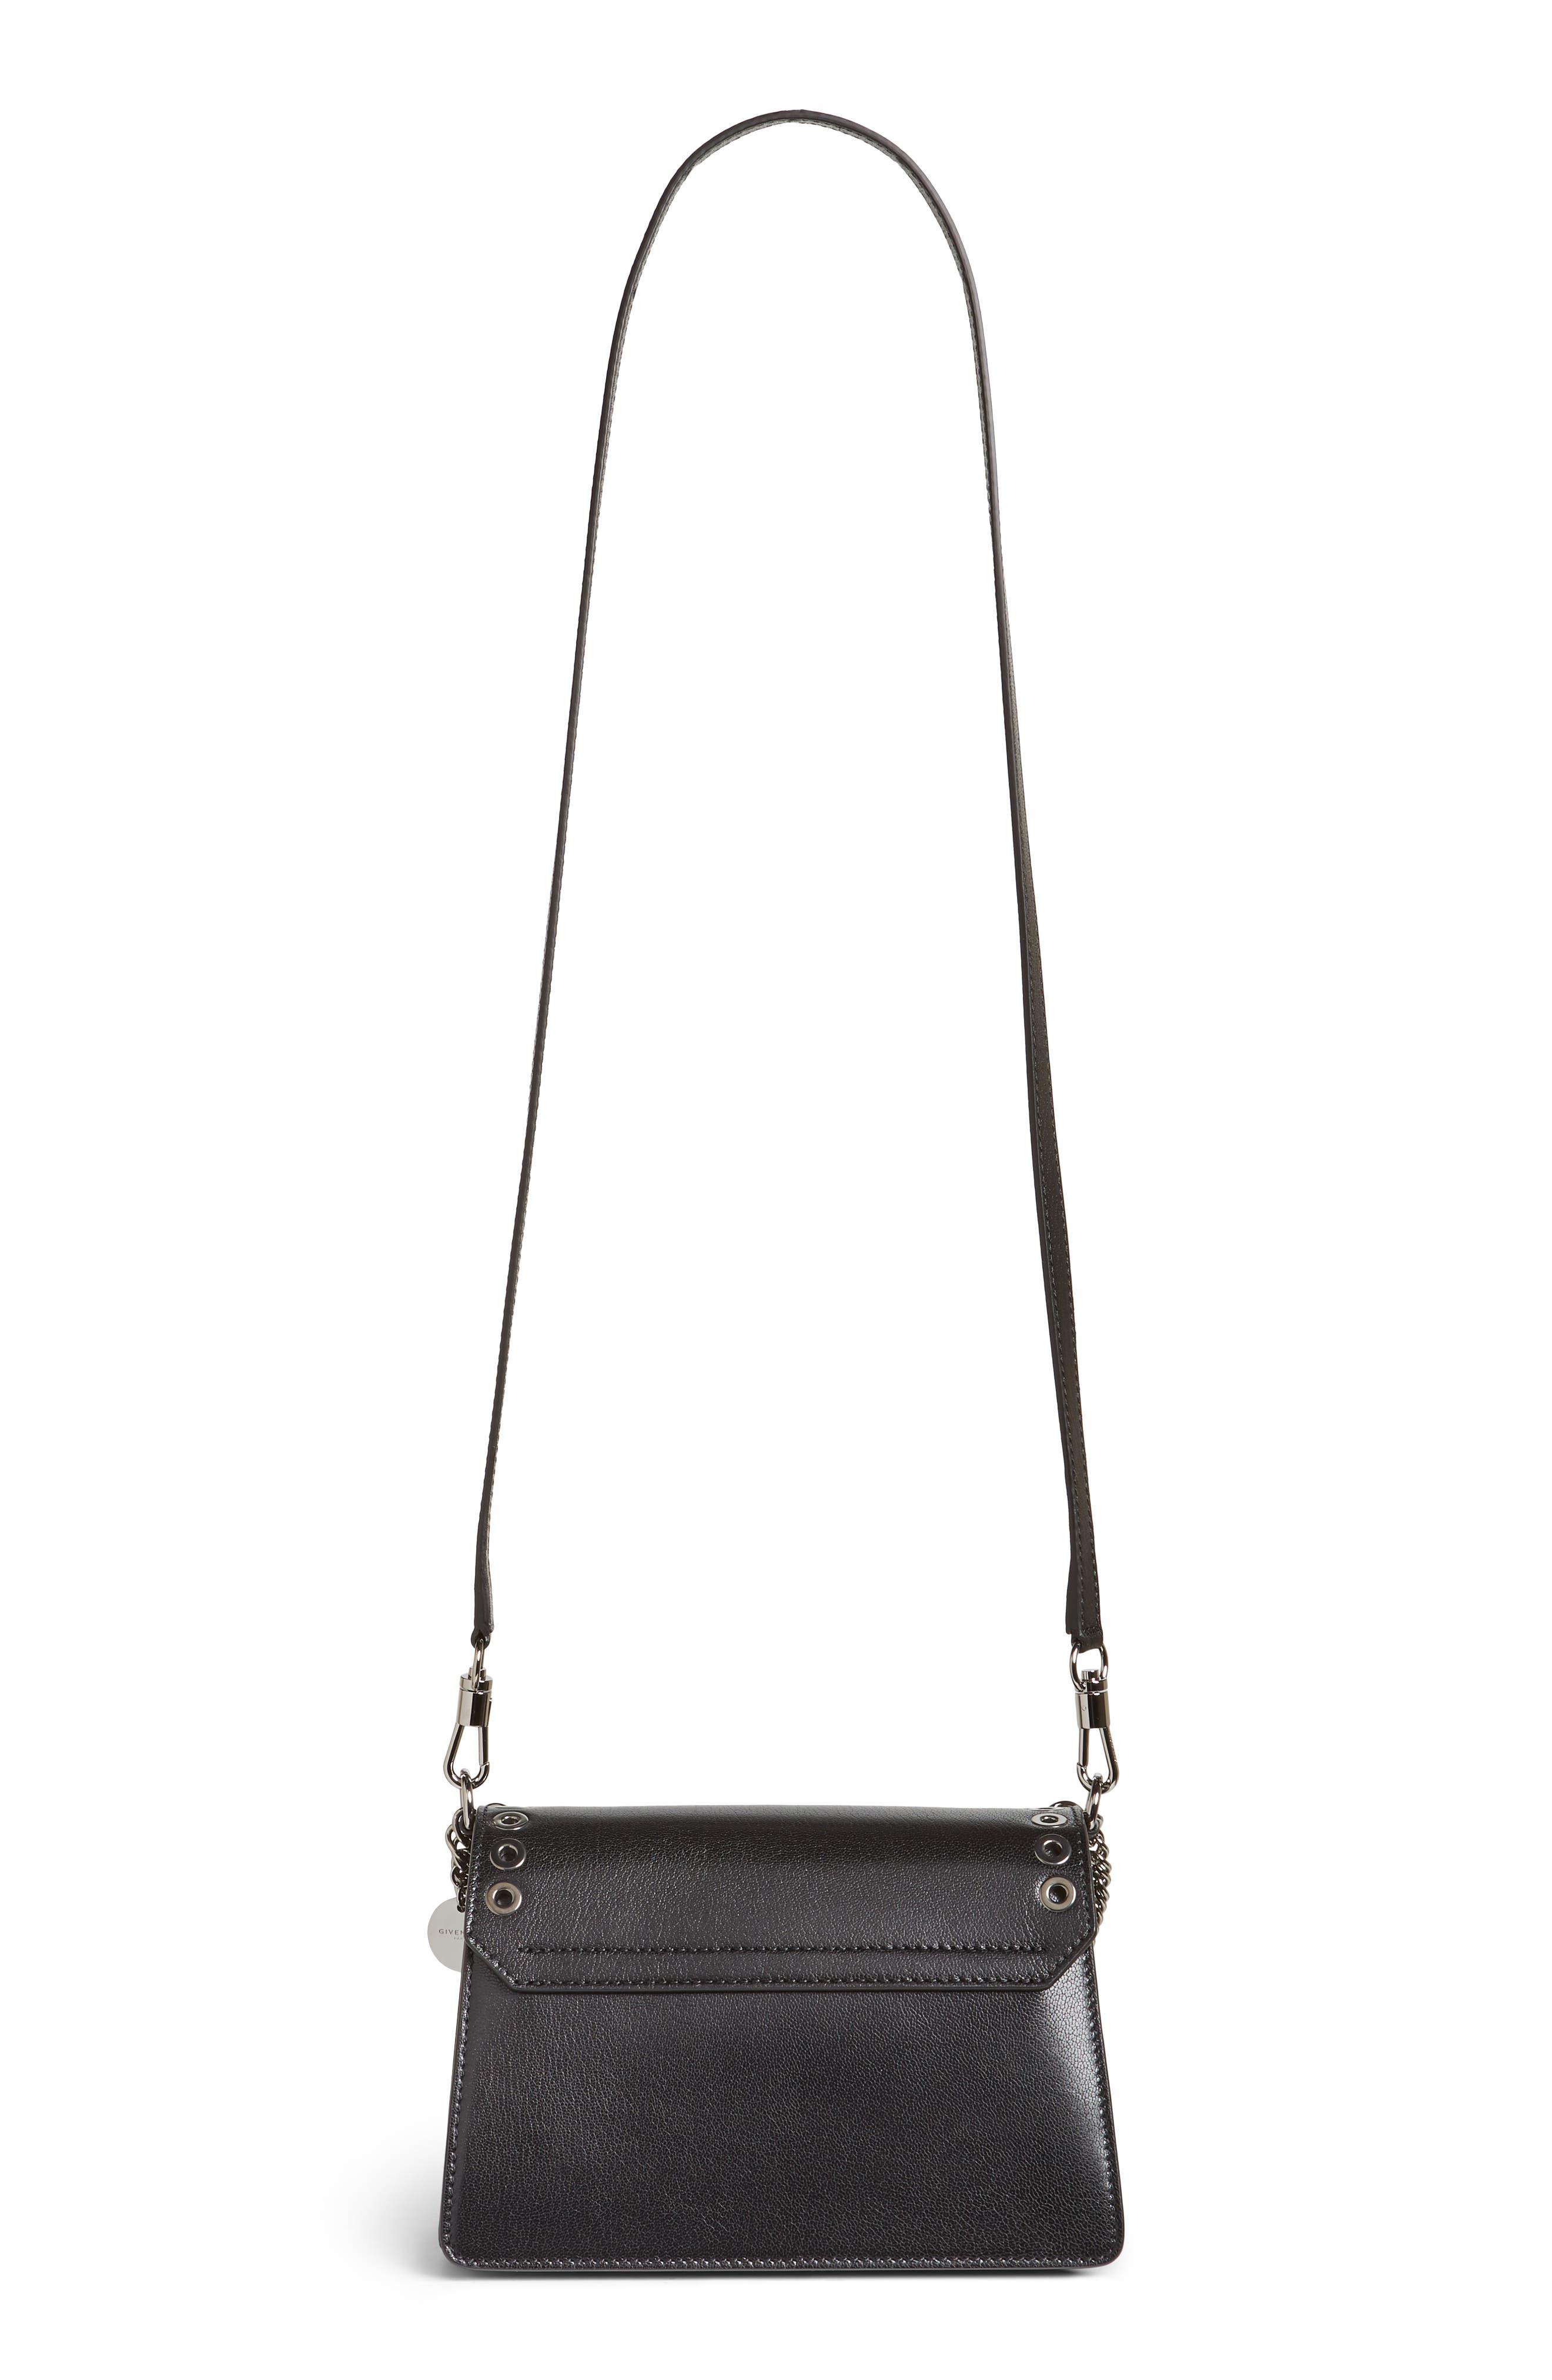 GIVENCHY,                             GV3 Eyelet and Rings Leather Shoulder Bag,                             Alternate thumbnail 3, color,                             BLACK